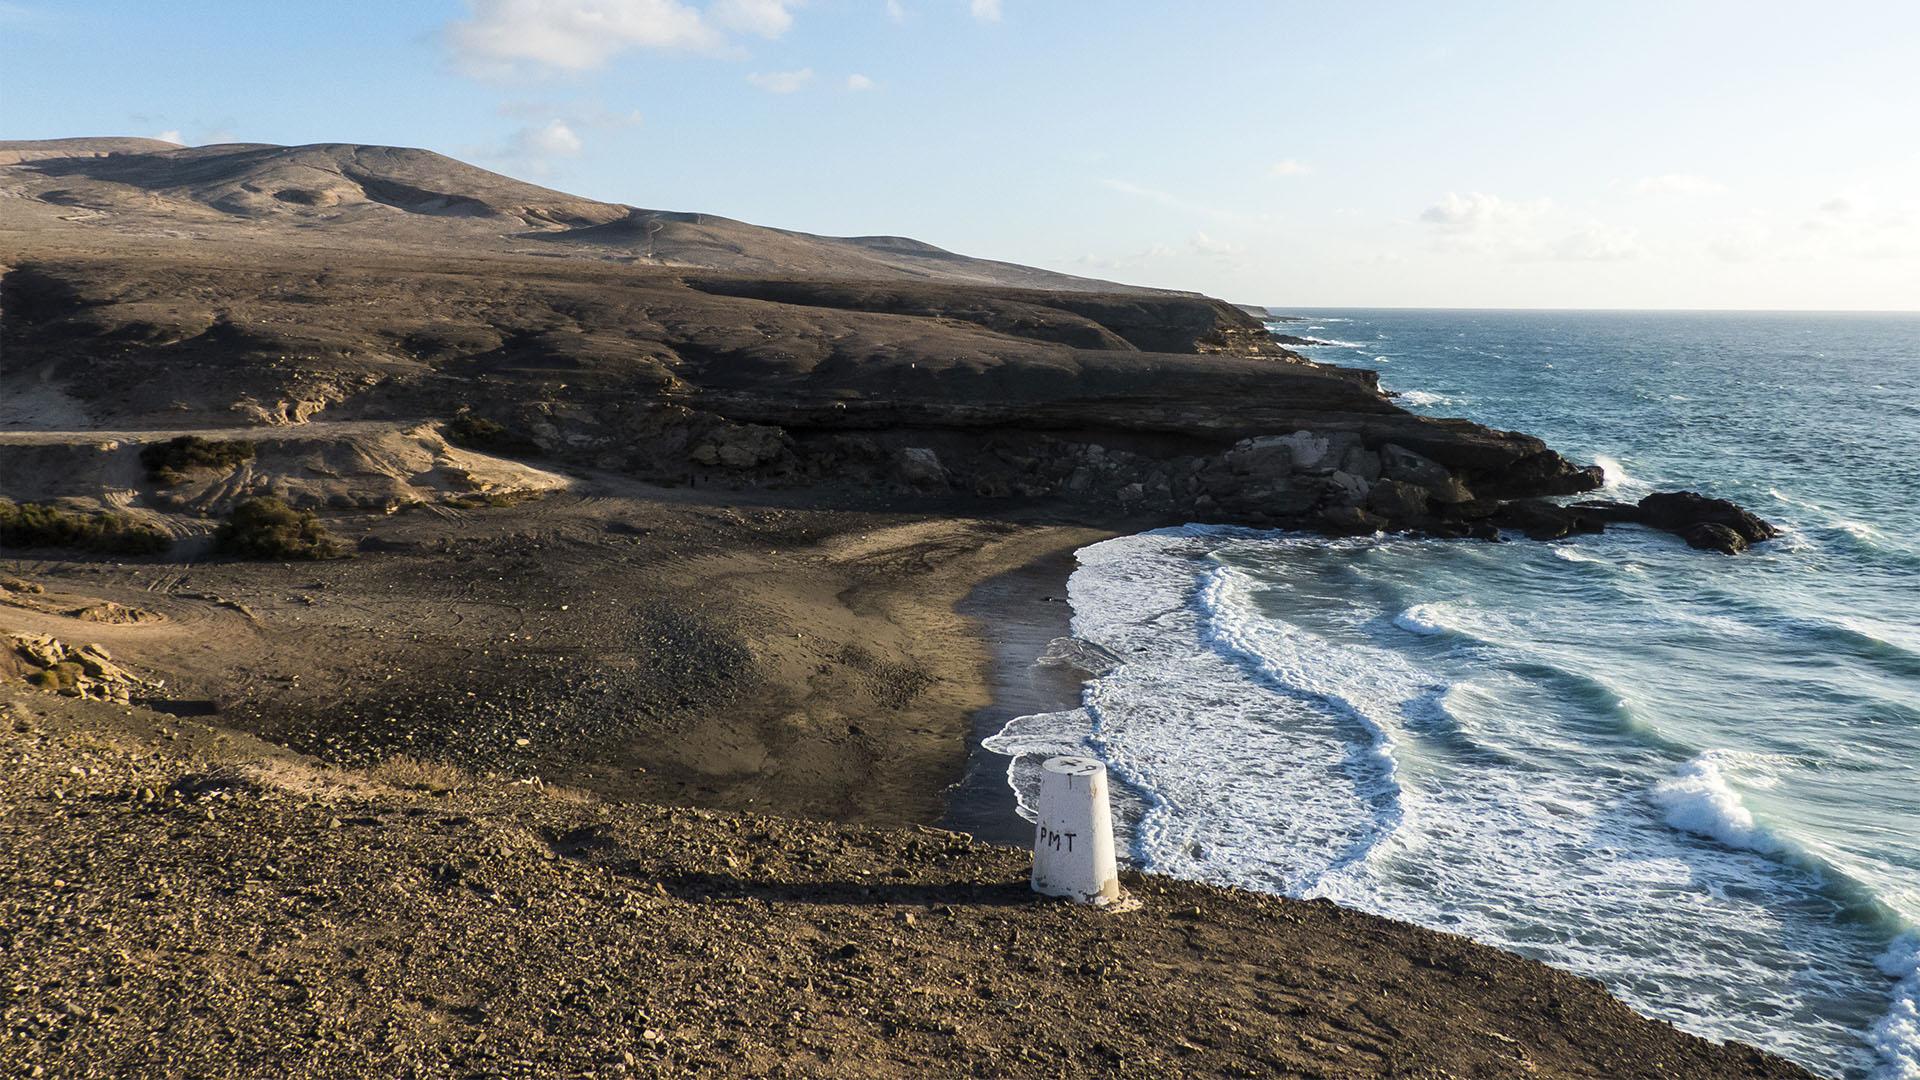 Die Strände Fuerteventuras: Playa de Vigocho